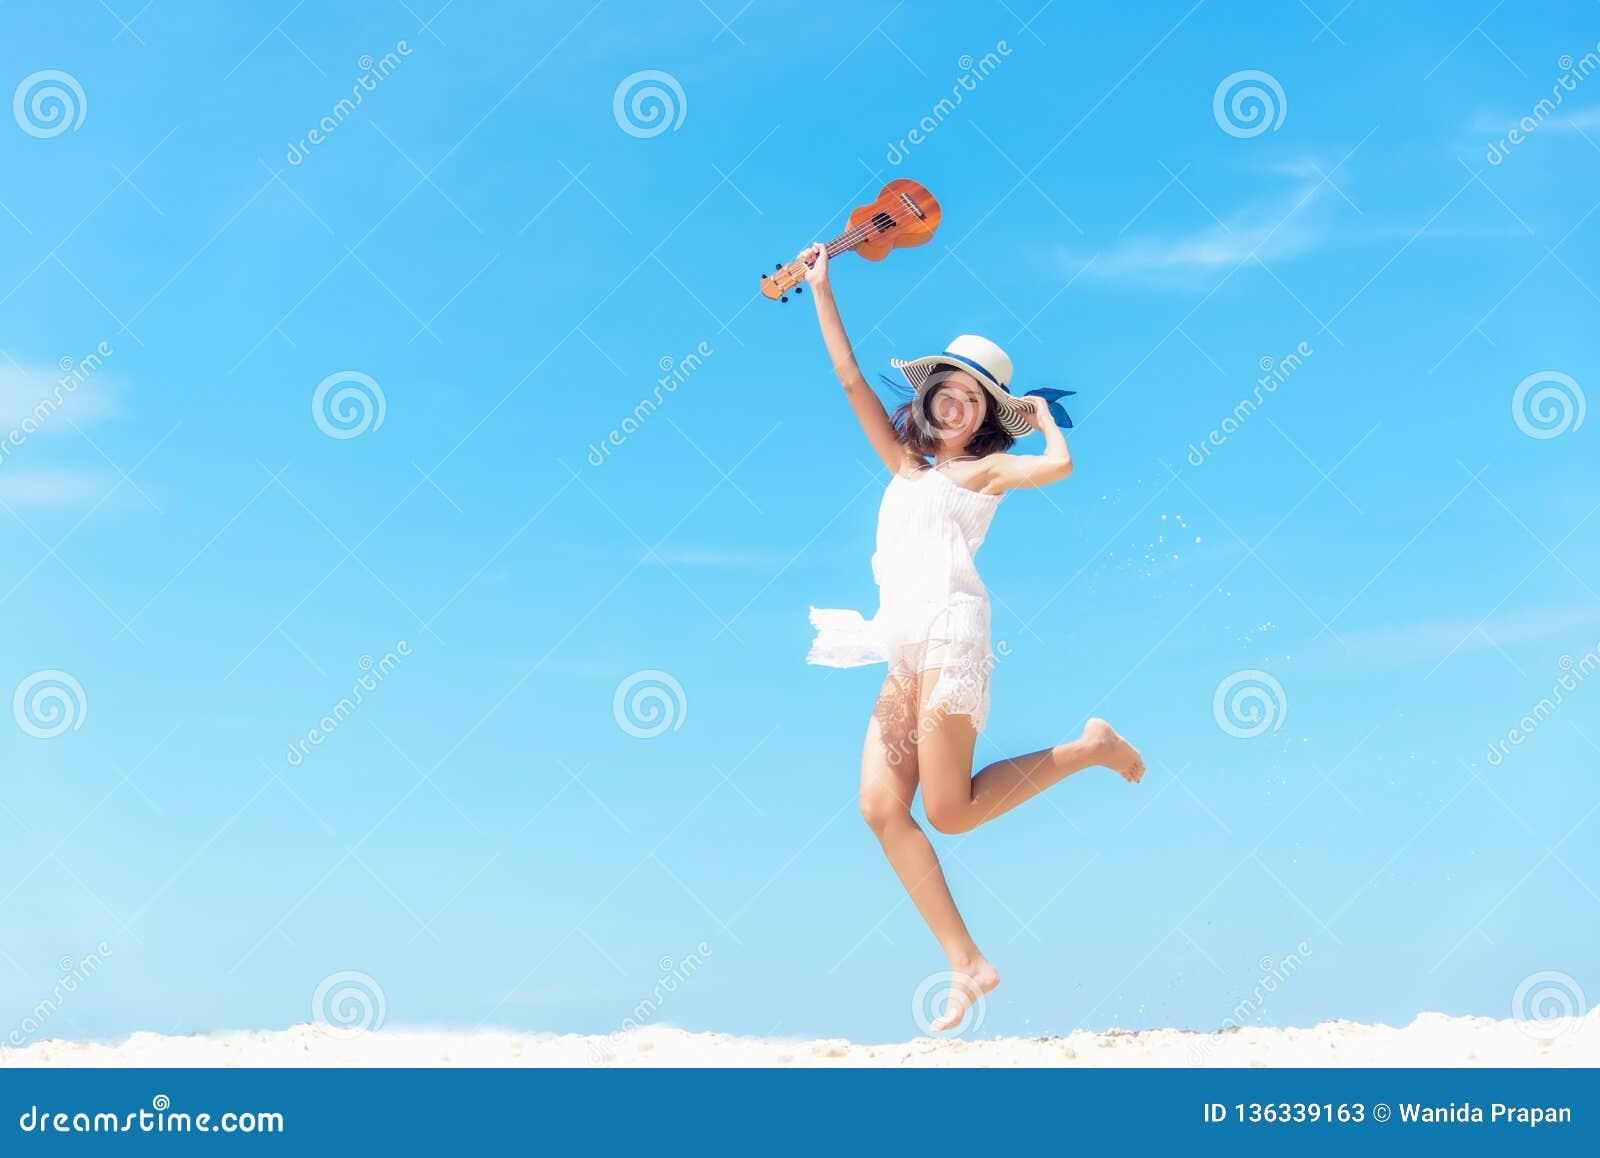 Katya krasnodar夏天领土假期 放松和跳跃与在海滩的尤克里里琴的嗅到的亚裔妇女,很愉快和豪华在假日夏天,